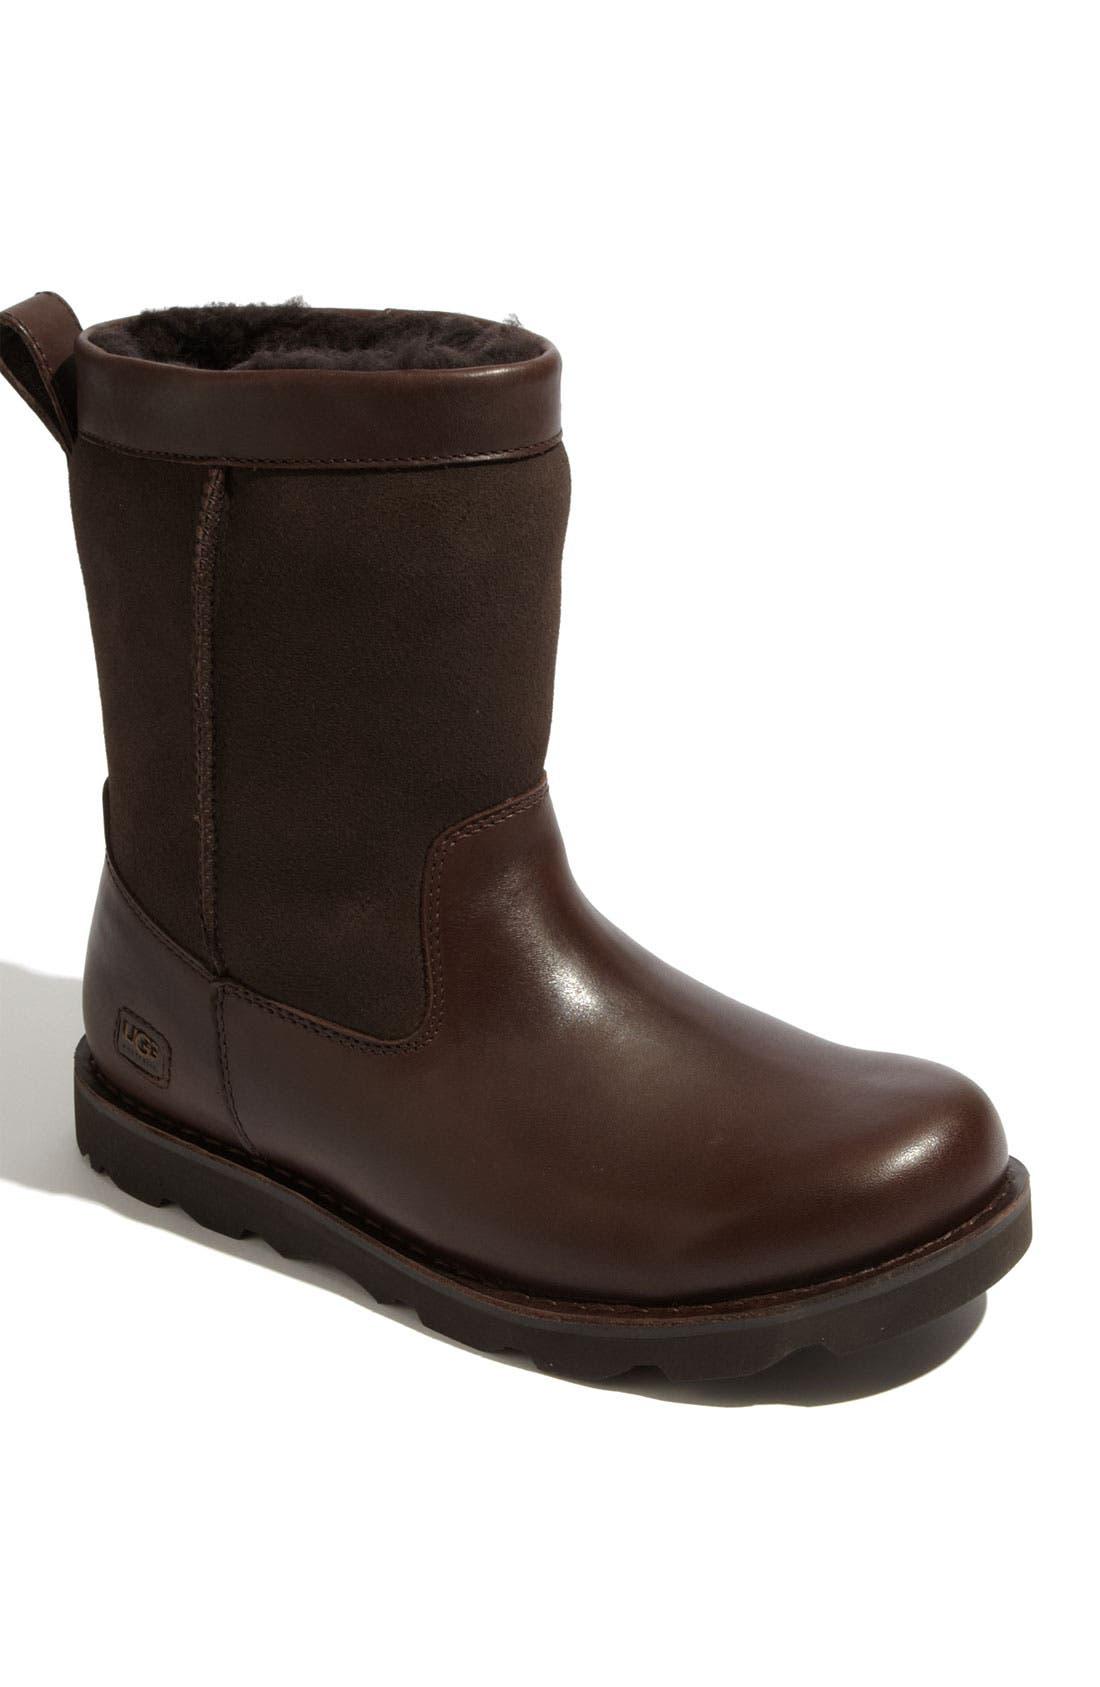 Main Image - UGG® 'Wrangell' Boot (Men)